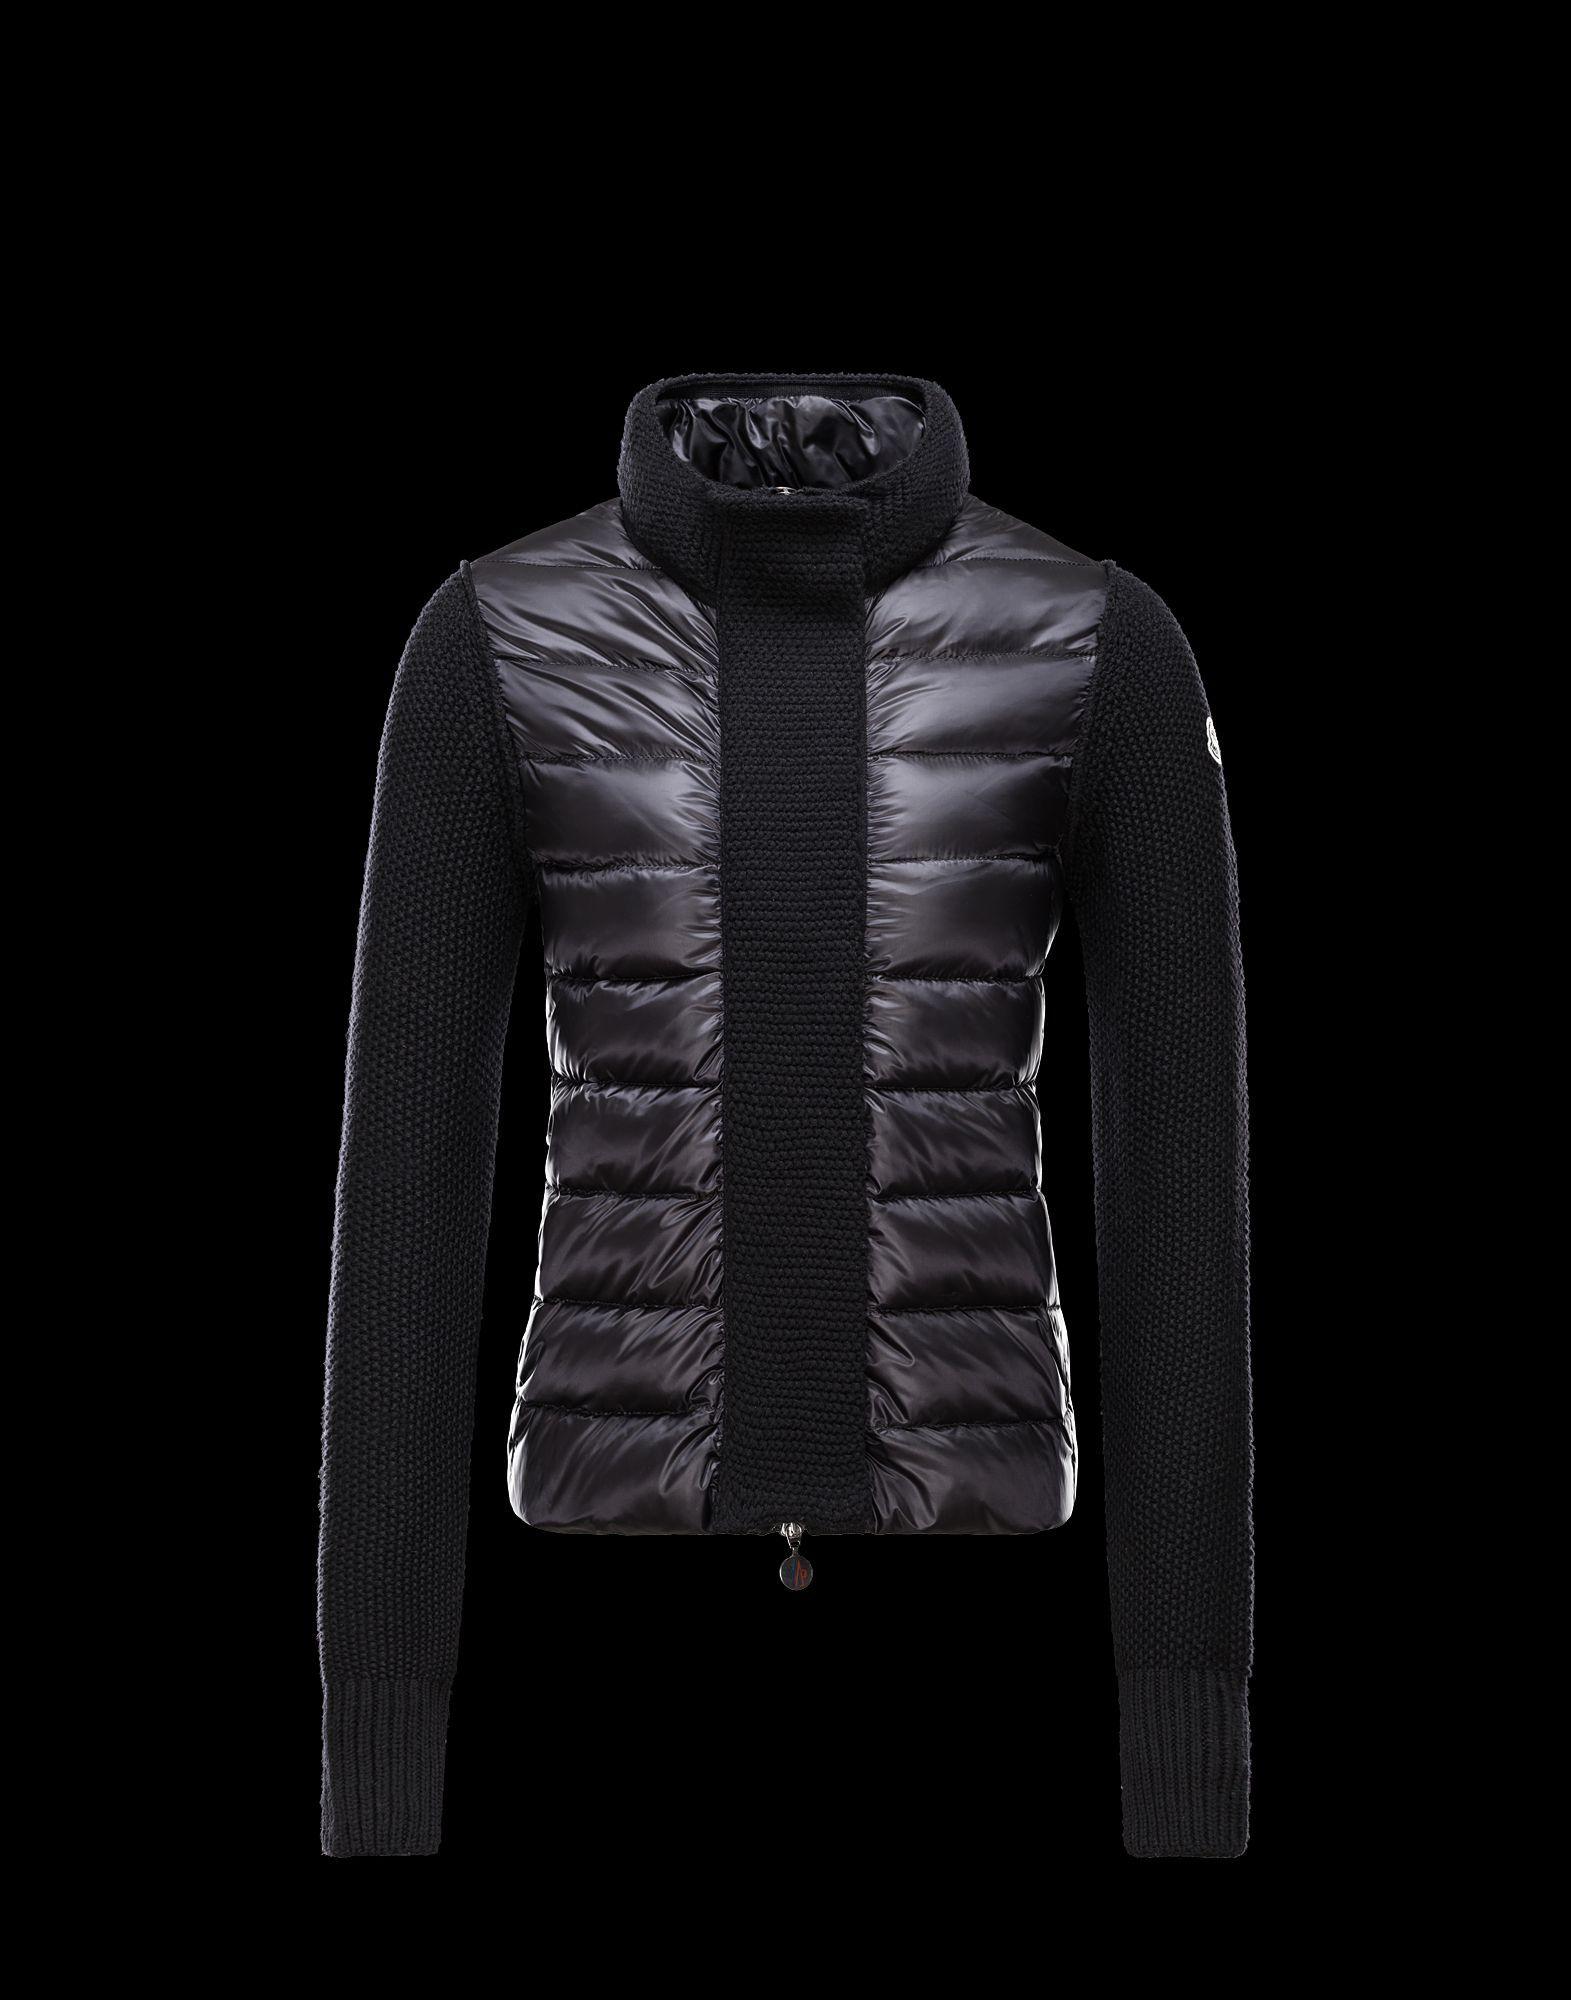 c76a02139 2016 Fall-Winter Moncler Cardigan Womens Sweater Black | Introducing ...